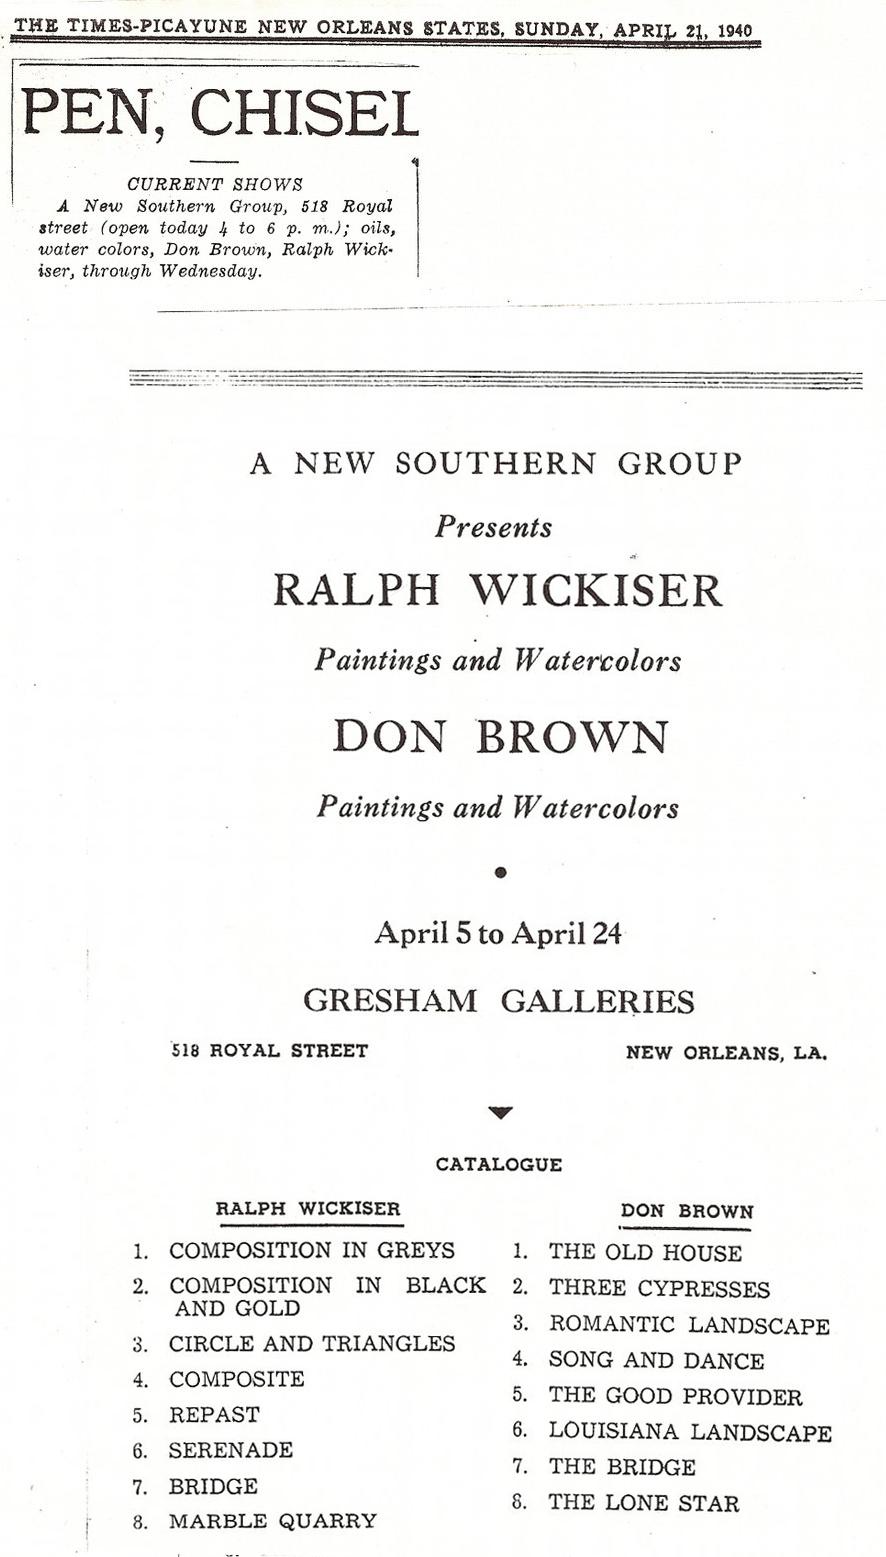 Gresham+Galleries_1940 copy.jpg